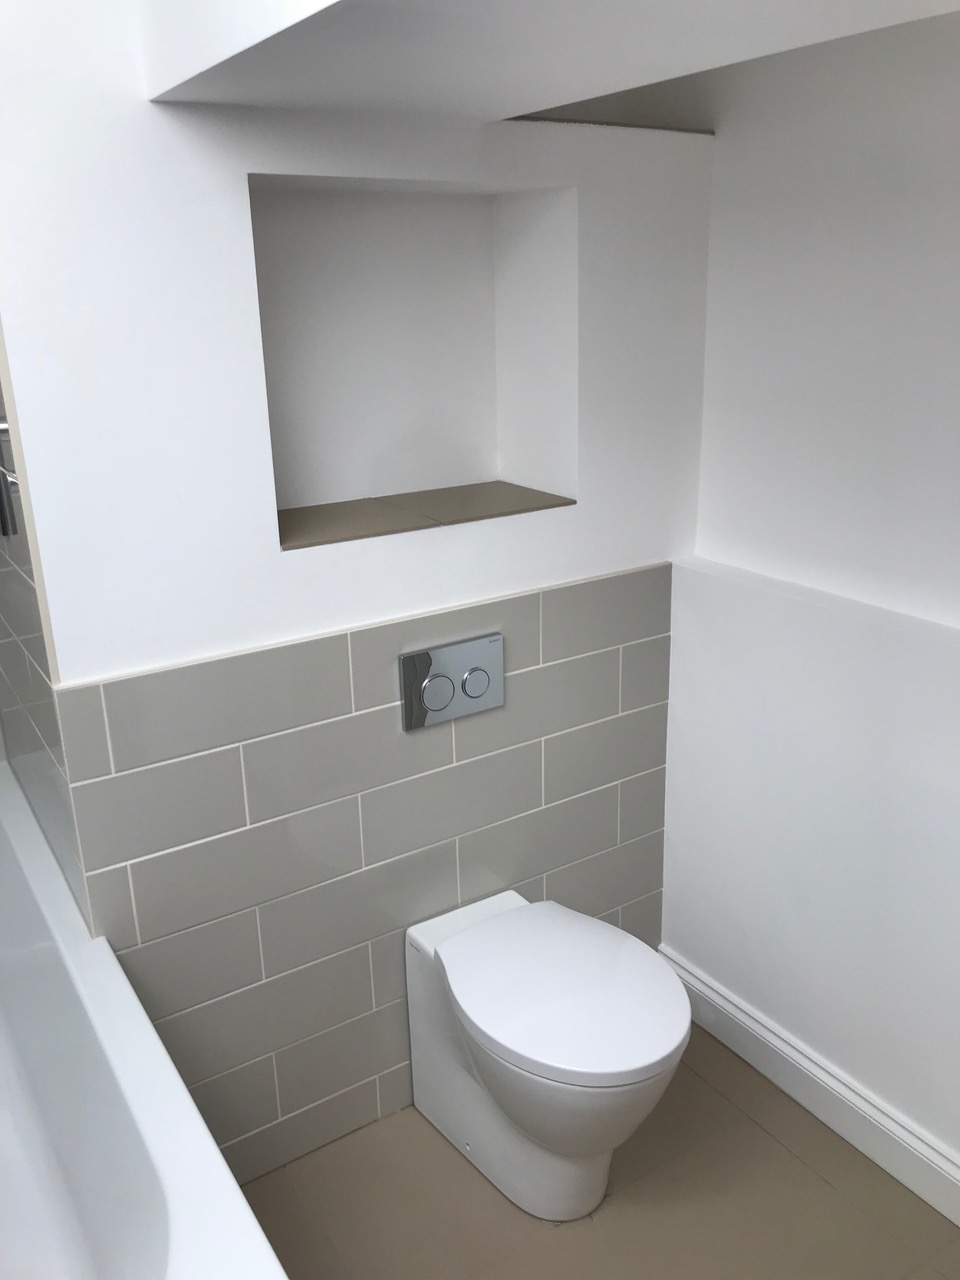 Bathroom Installation - Ecoflo UK Kitchens, Bathrooms ...